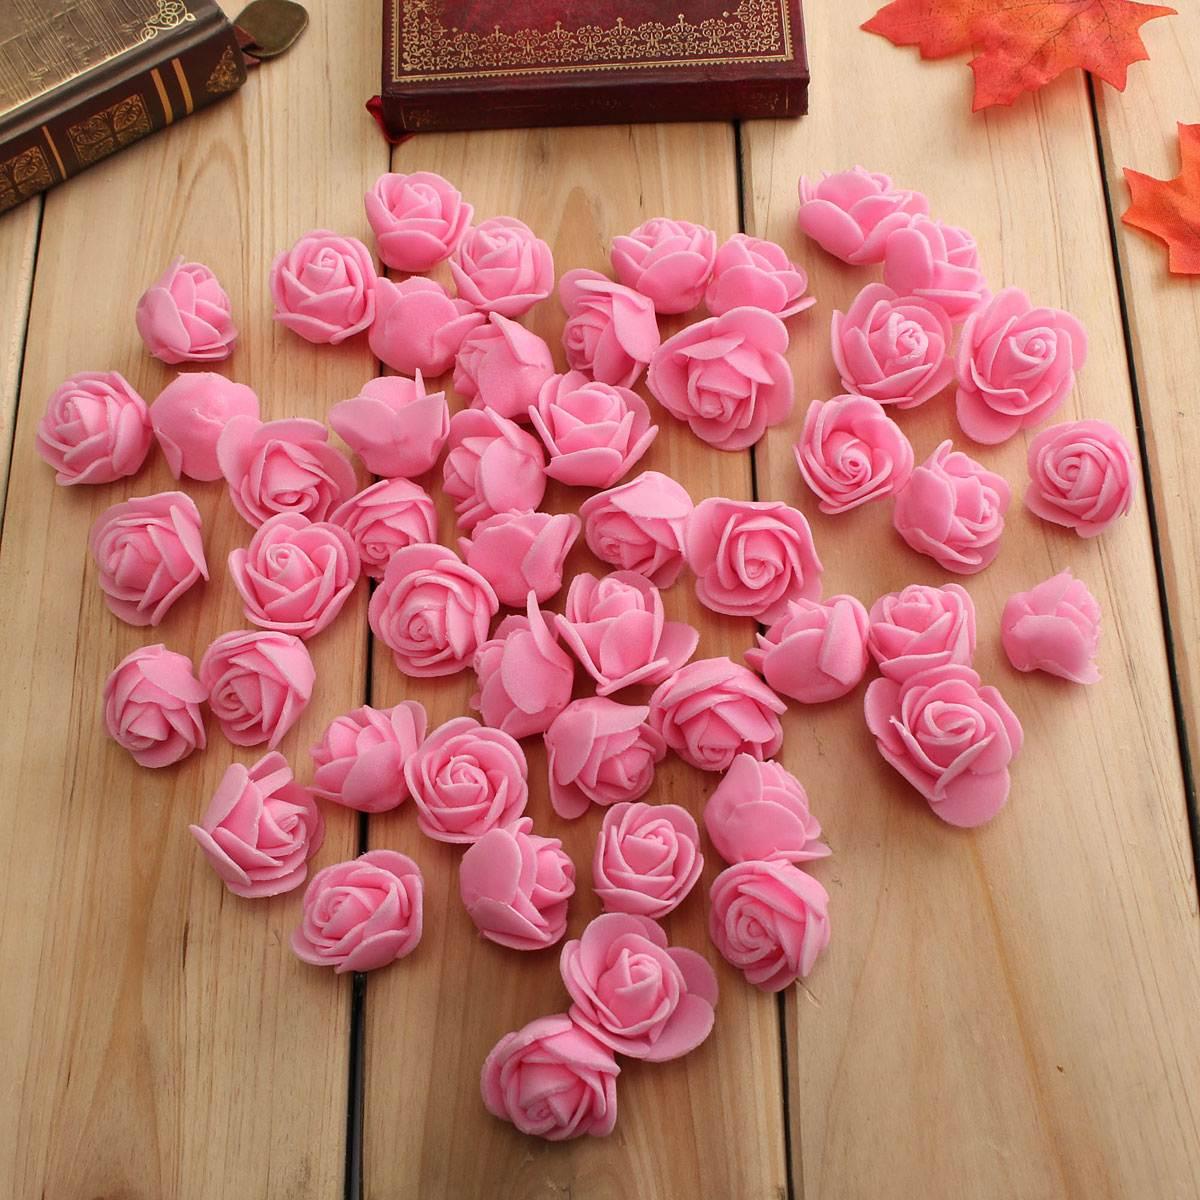 50PCS/Bag PE Foam Rose Flower Head Handmade DIY Wedding Home ...